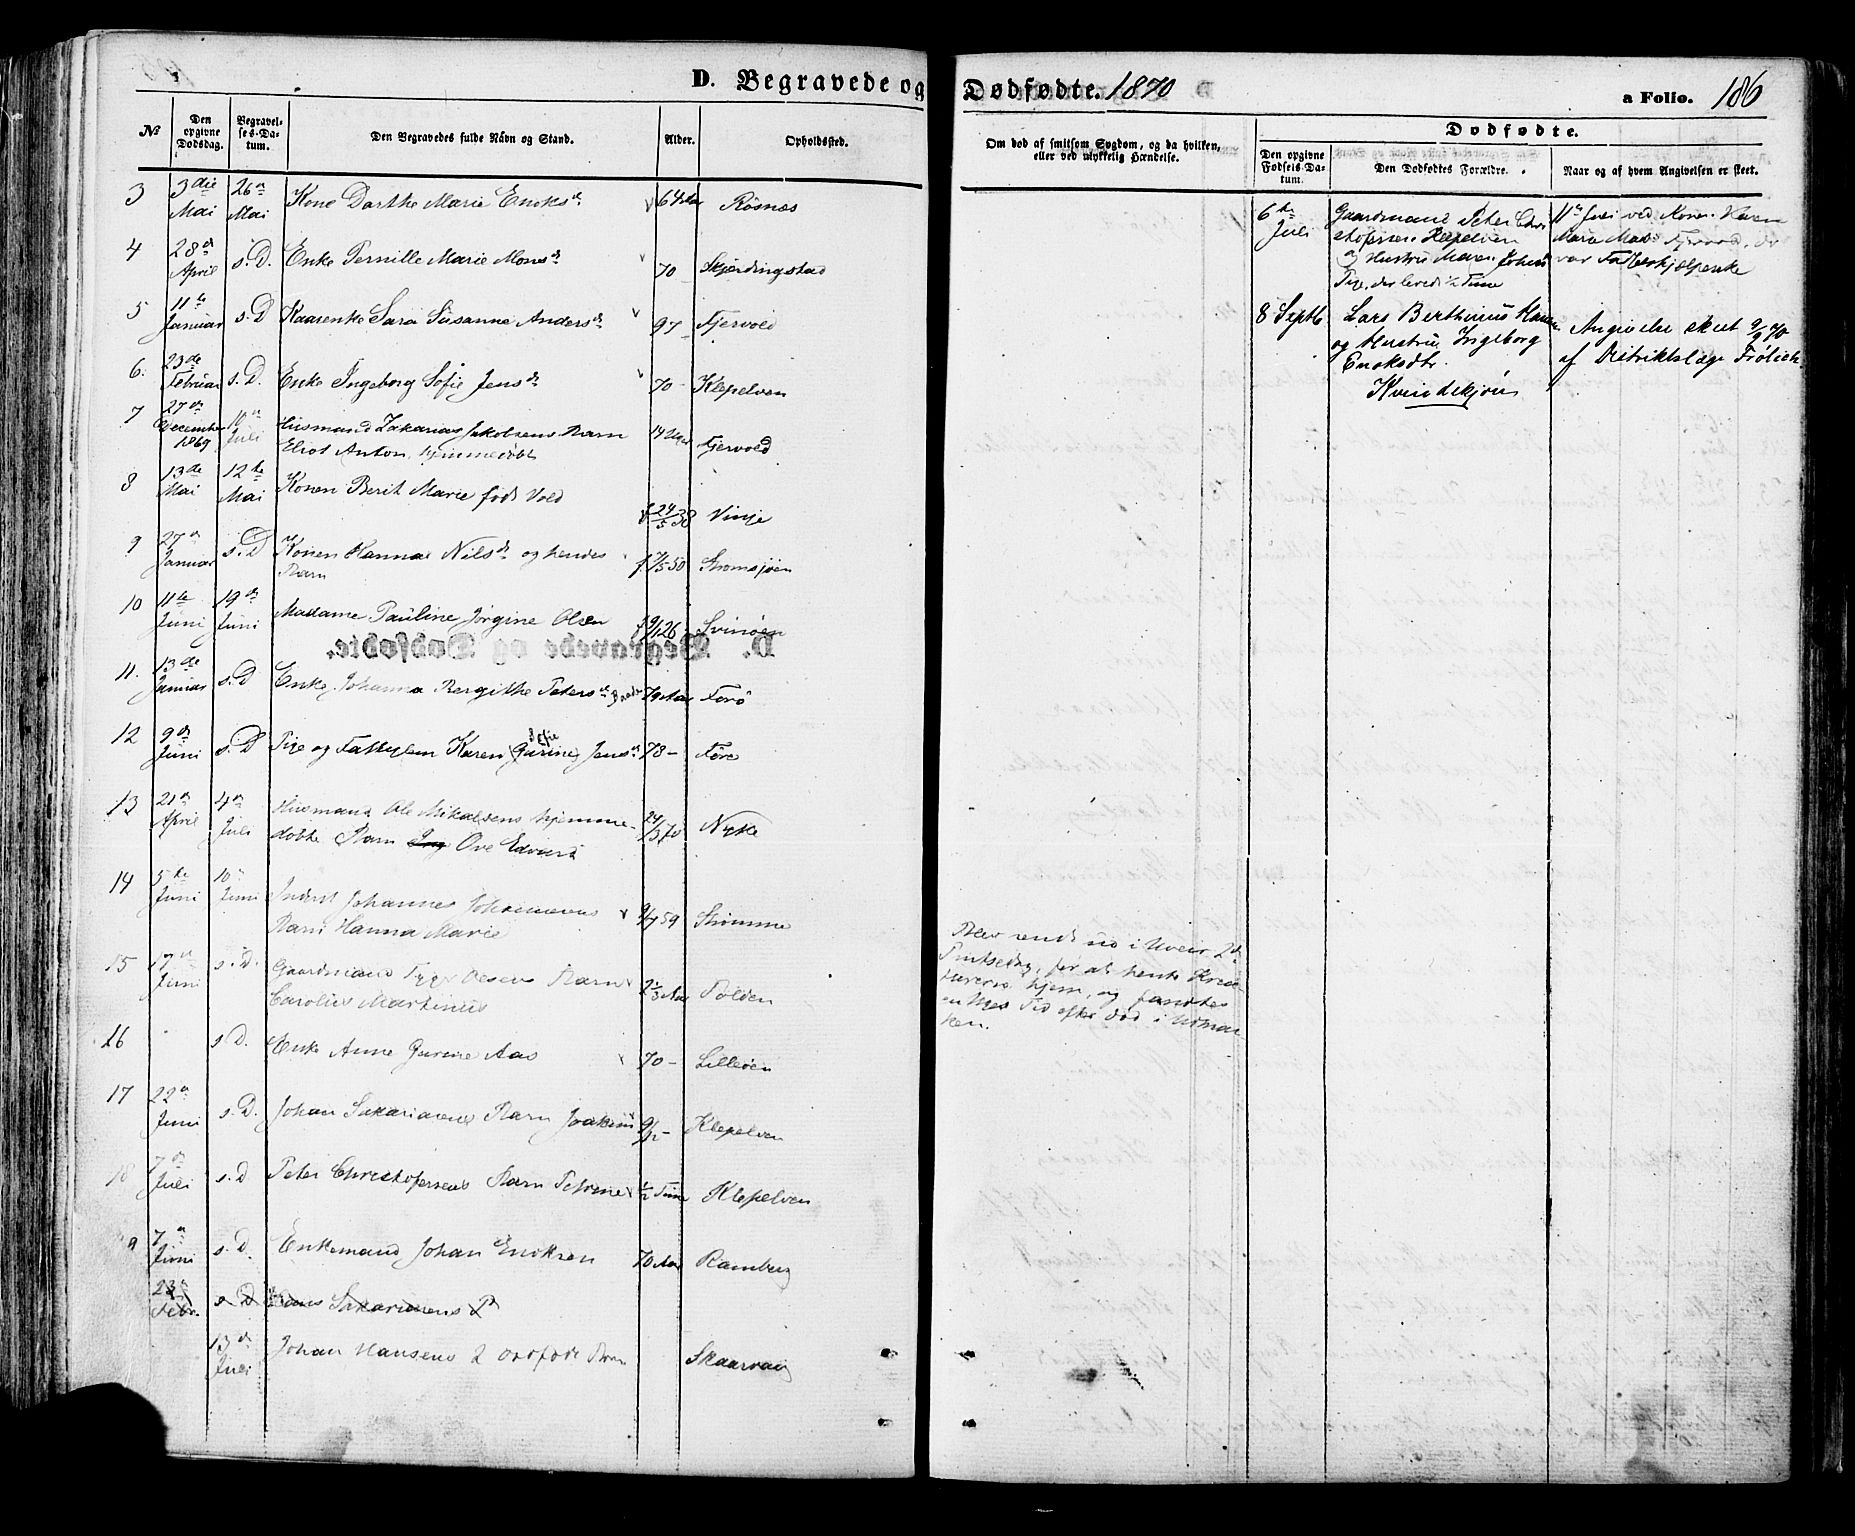 SAT, Ministerialprotokoller, klokkerbøker og fødselsregistre - Nordland, 891/L1301: Ministerialbok nr. 891A06, 1870-1878, s. 186